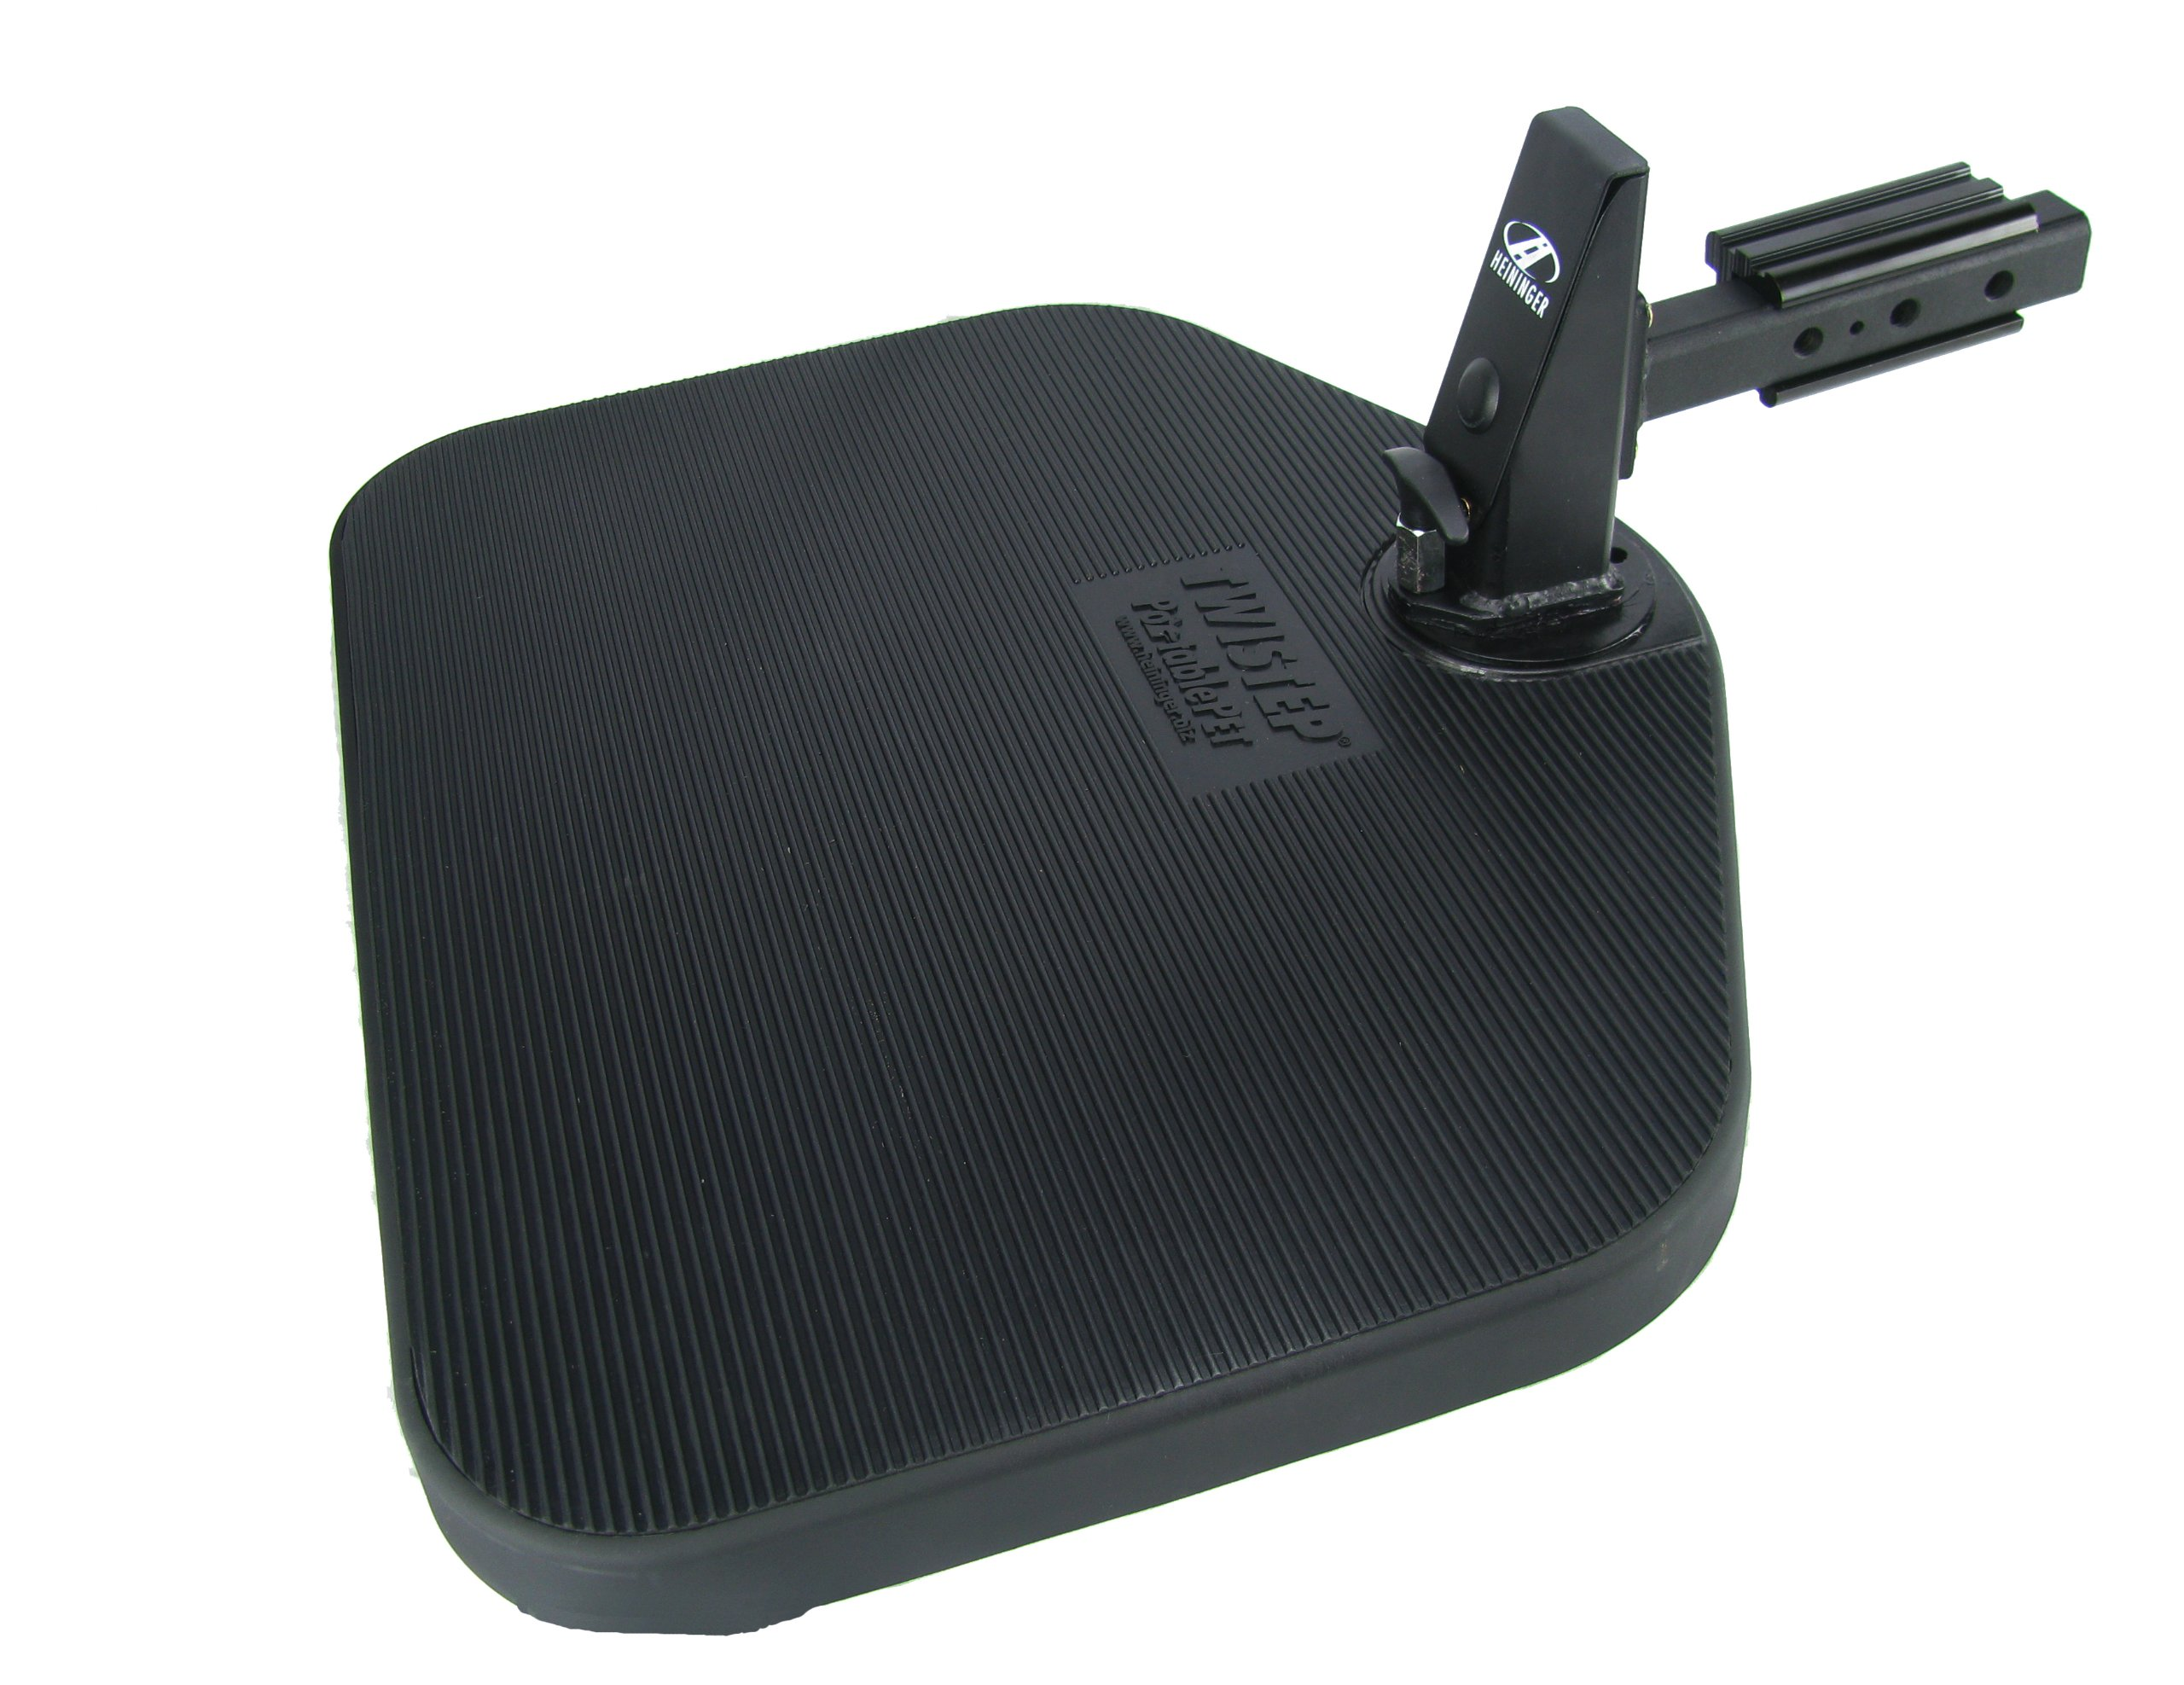 Heininger 3052 PortablePET Twistep Hitch